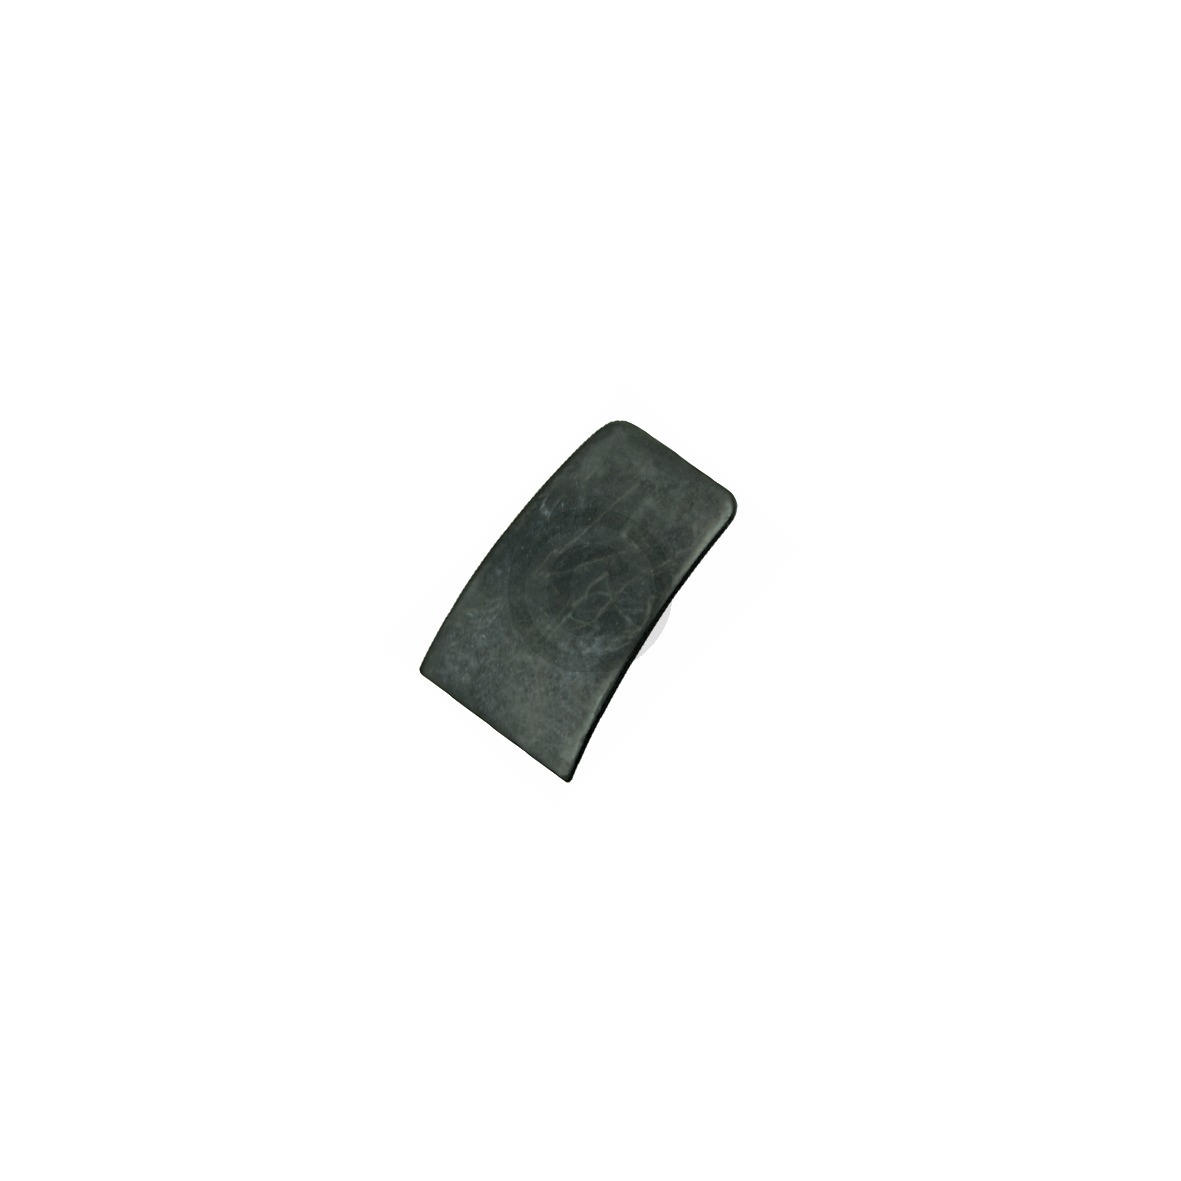 Knebelfeder 12x7,5mm 899661301300 AEG, Electrolux, Juno, Zanussi